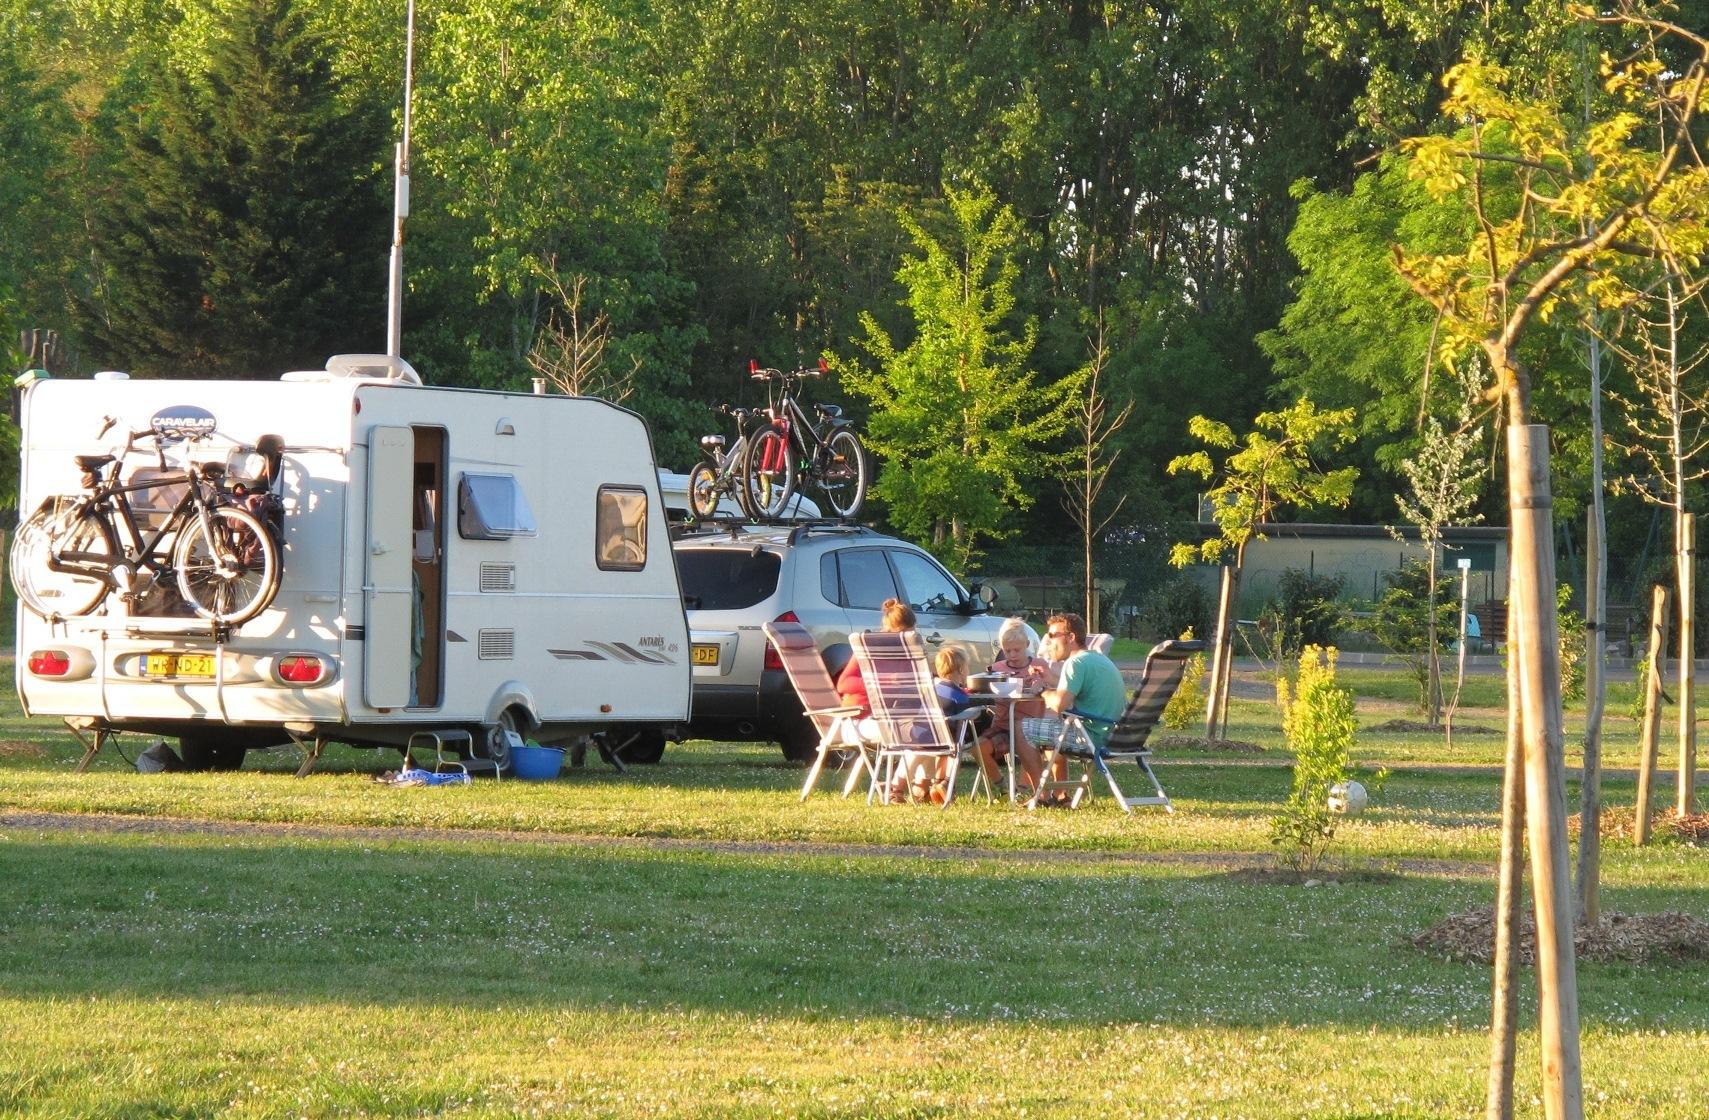 Frankrijk-Anse-Camping%20Les%20Portes%20du%20Beaujolais-ExtraLarge Campings Frankrijk